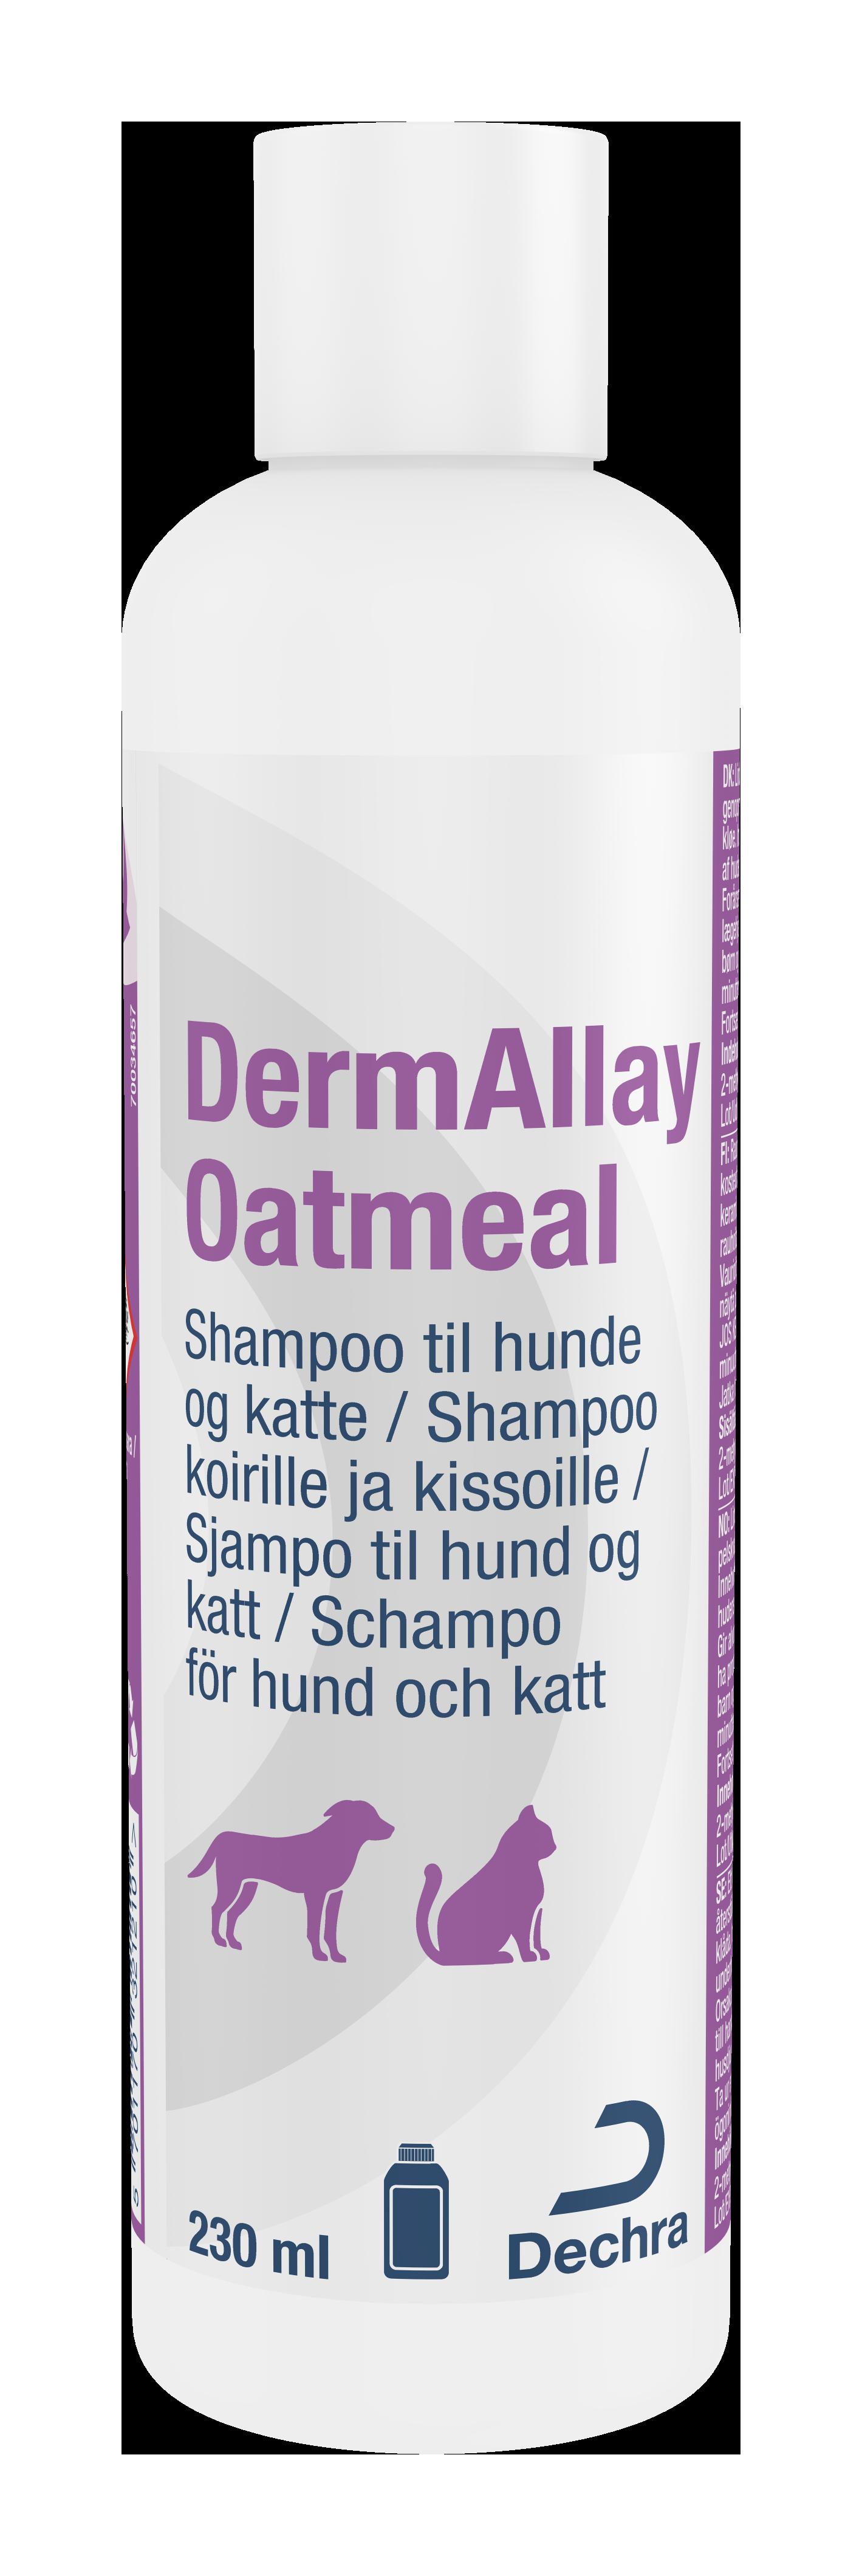 DermAllay Oatmeal Schampo - 230 ml